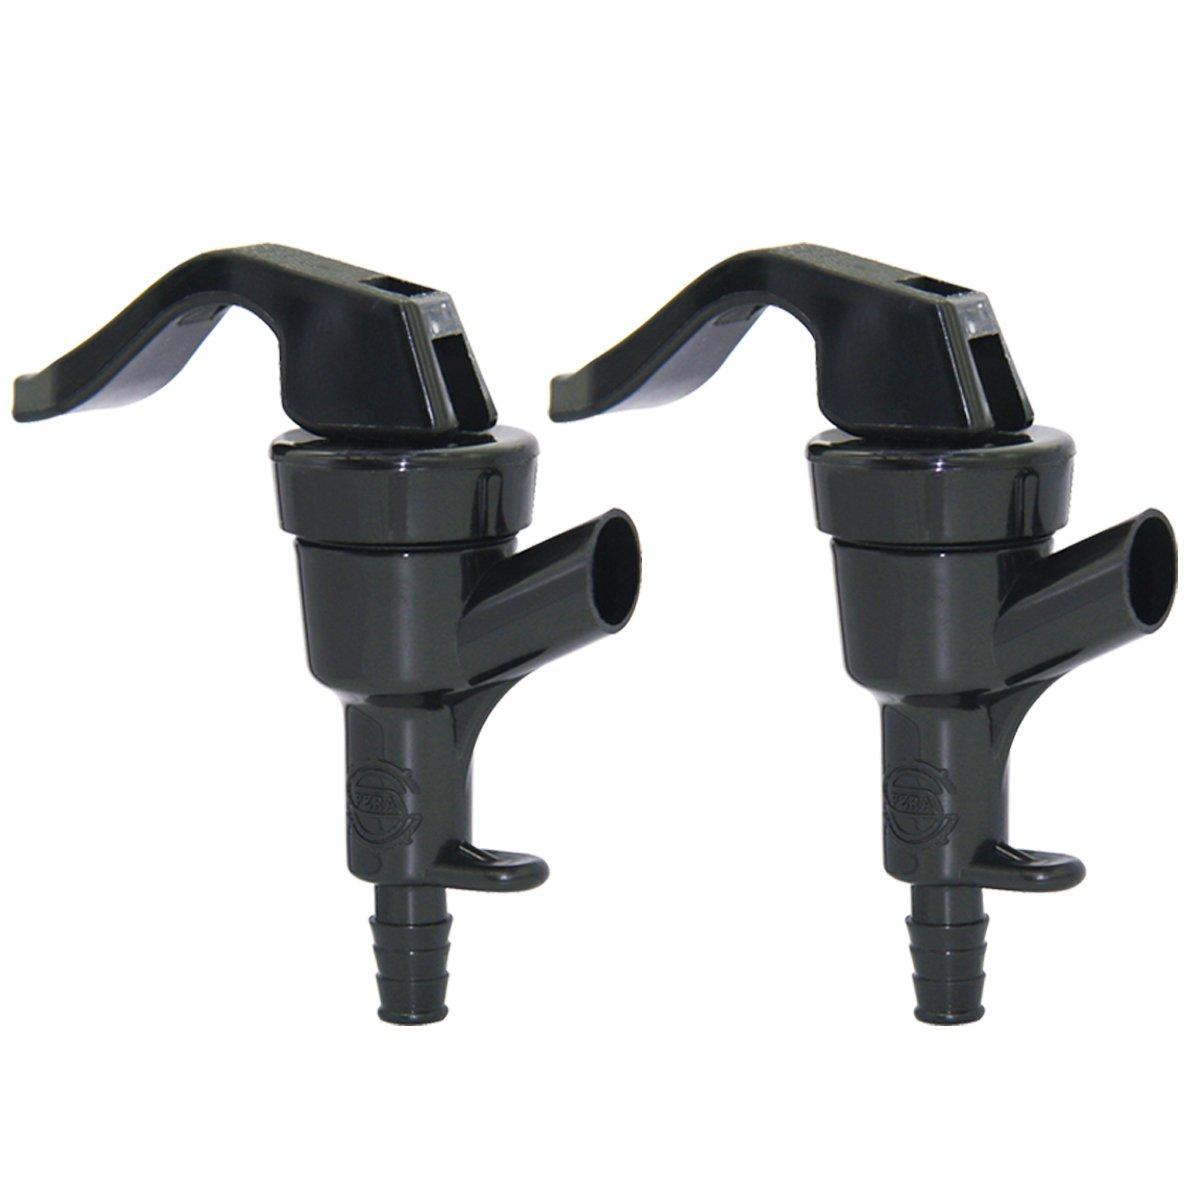 PERA 2 Pack Picnic Tap Faucet Disconnects Spigot keg Bottling Bucket Tap